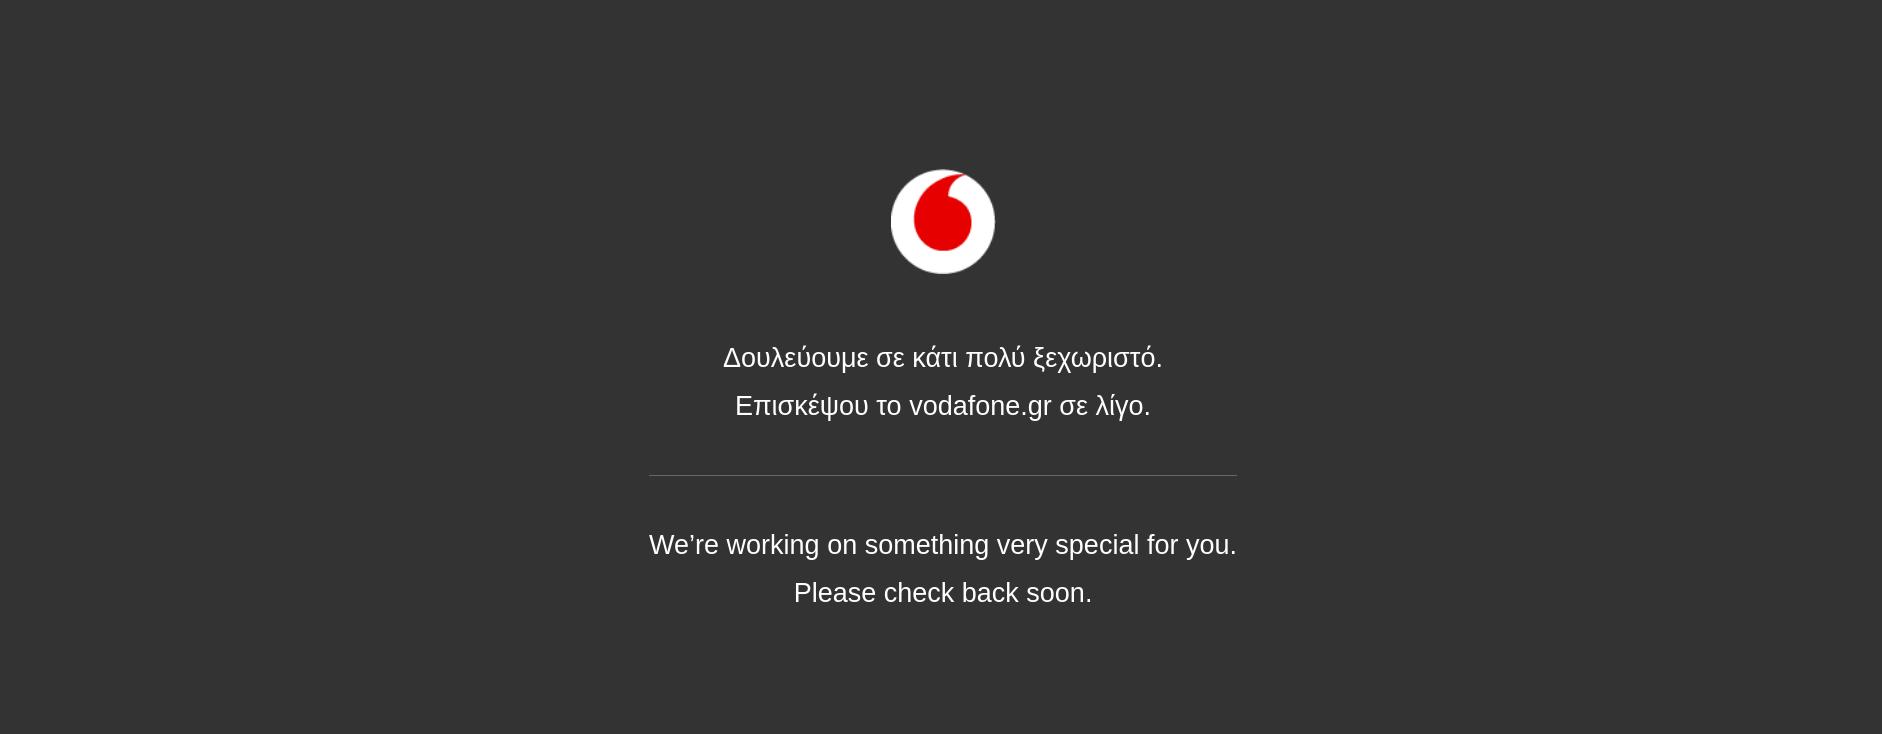 Screenshot 2020 09 30 18 08 46 - Vodafone γενικό downtime